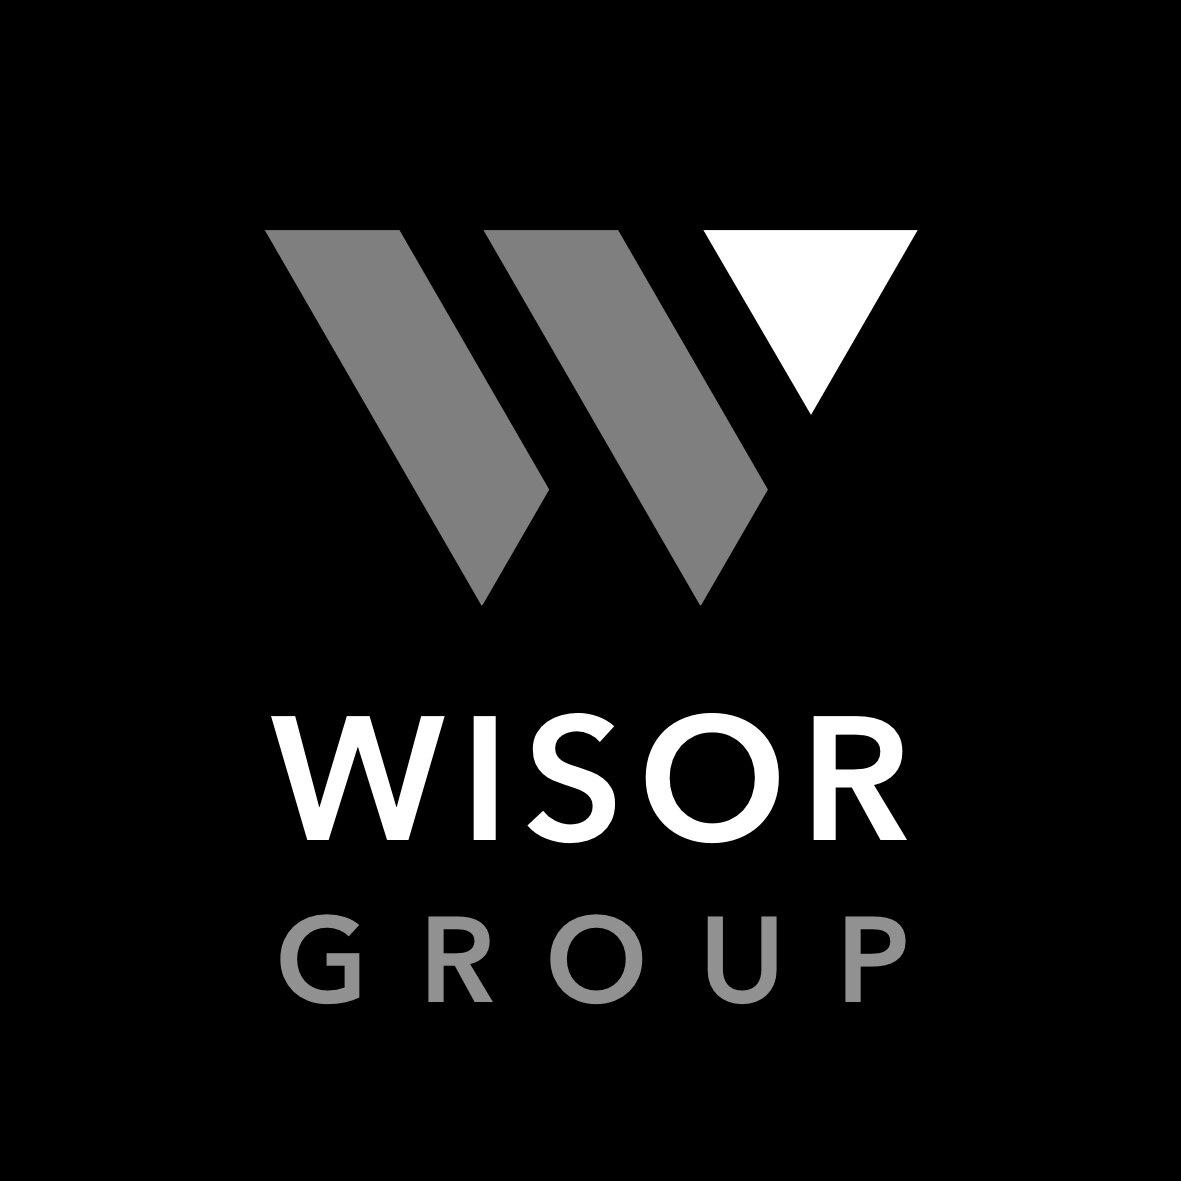 Wisor Group Logo.jpg  For download click on image.